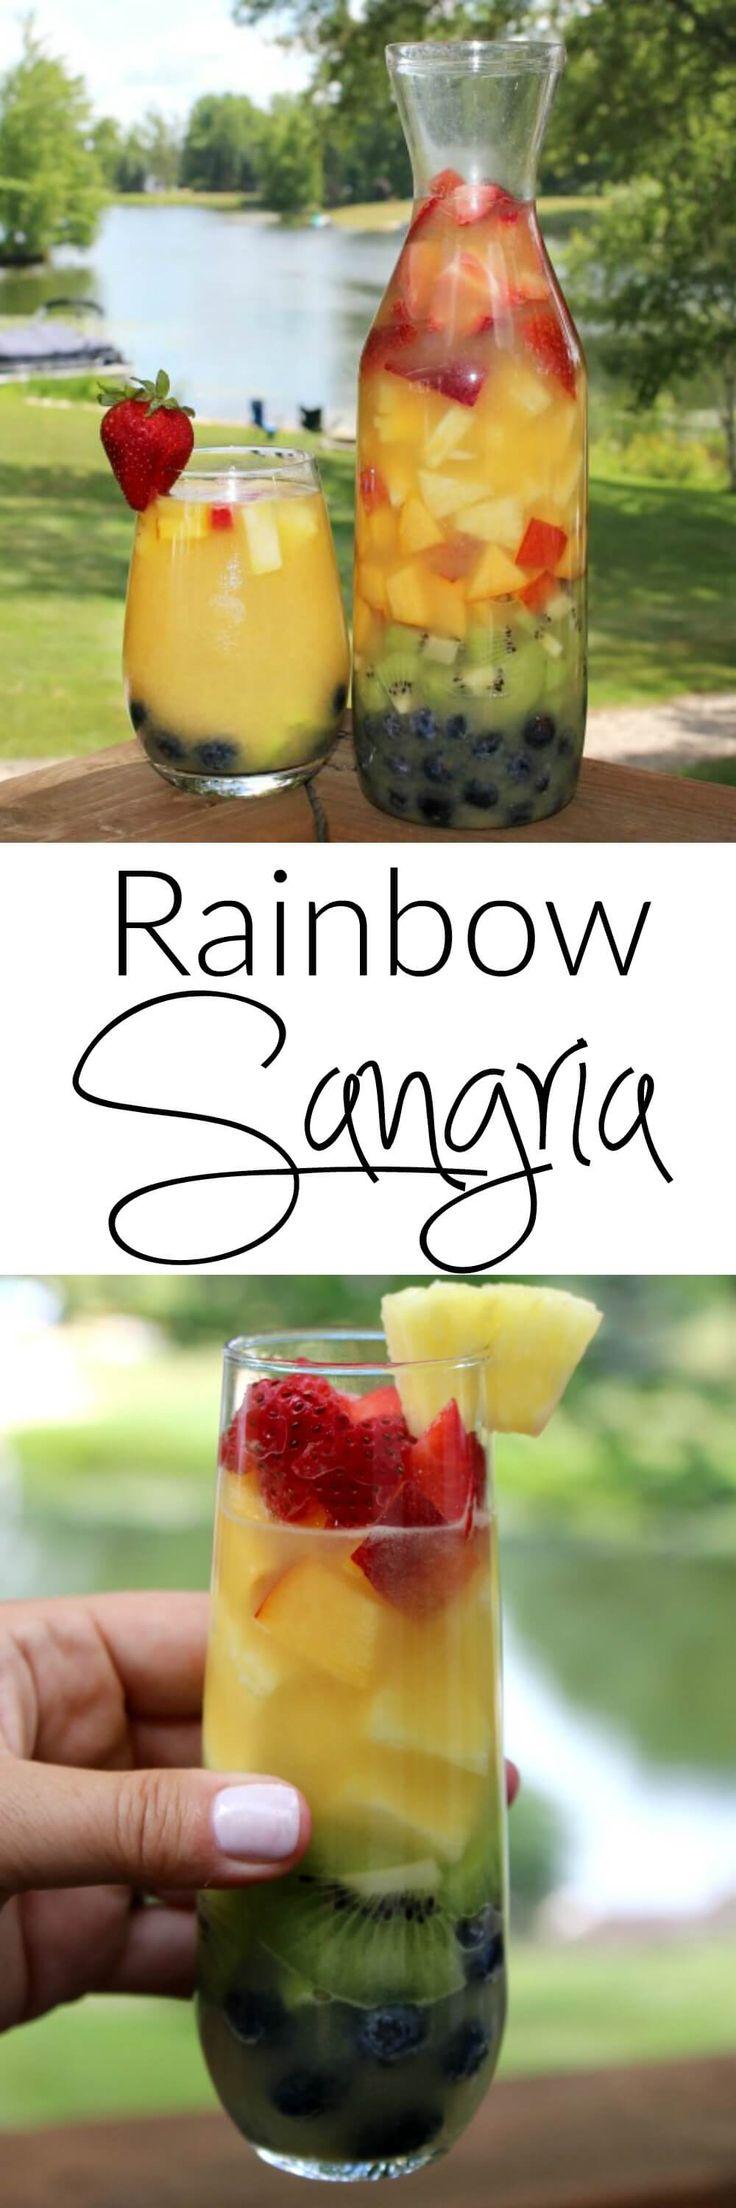 Rainbow Sangria - this easy white wine sangria recipe tastes even better than it looks